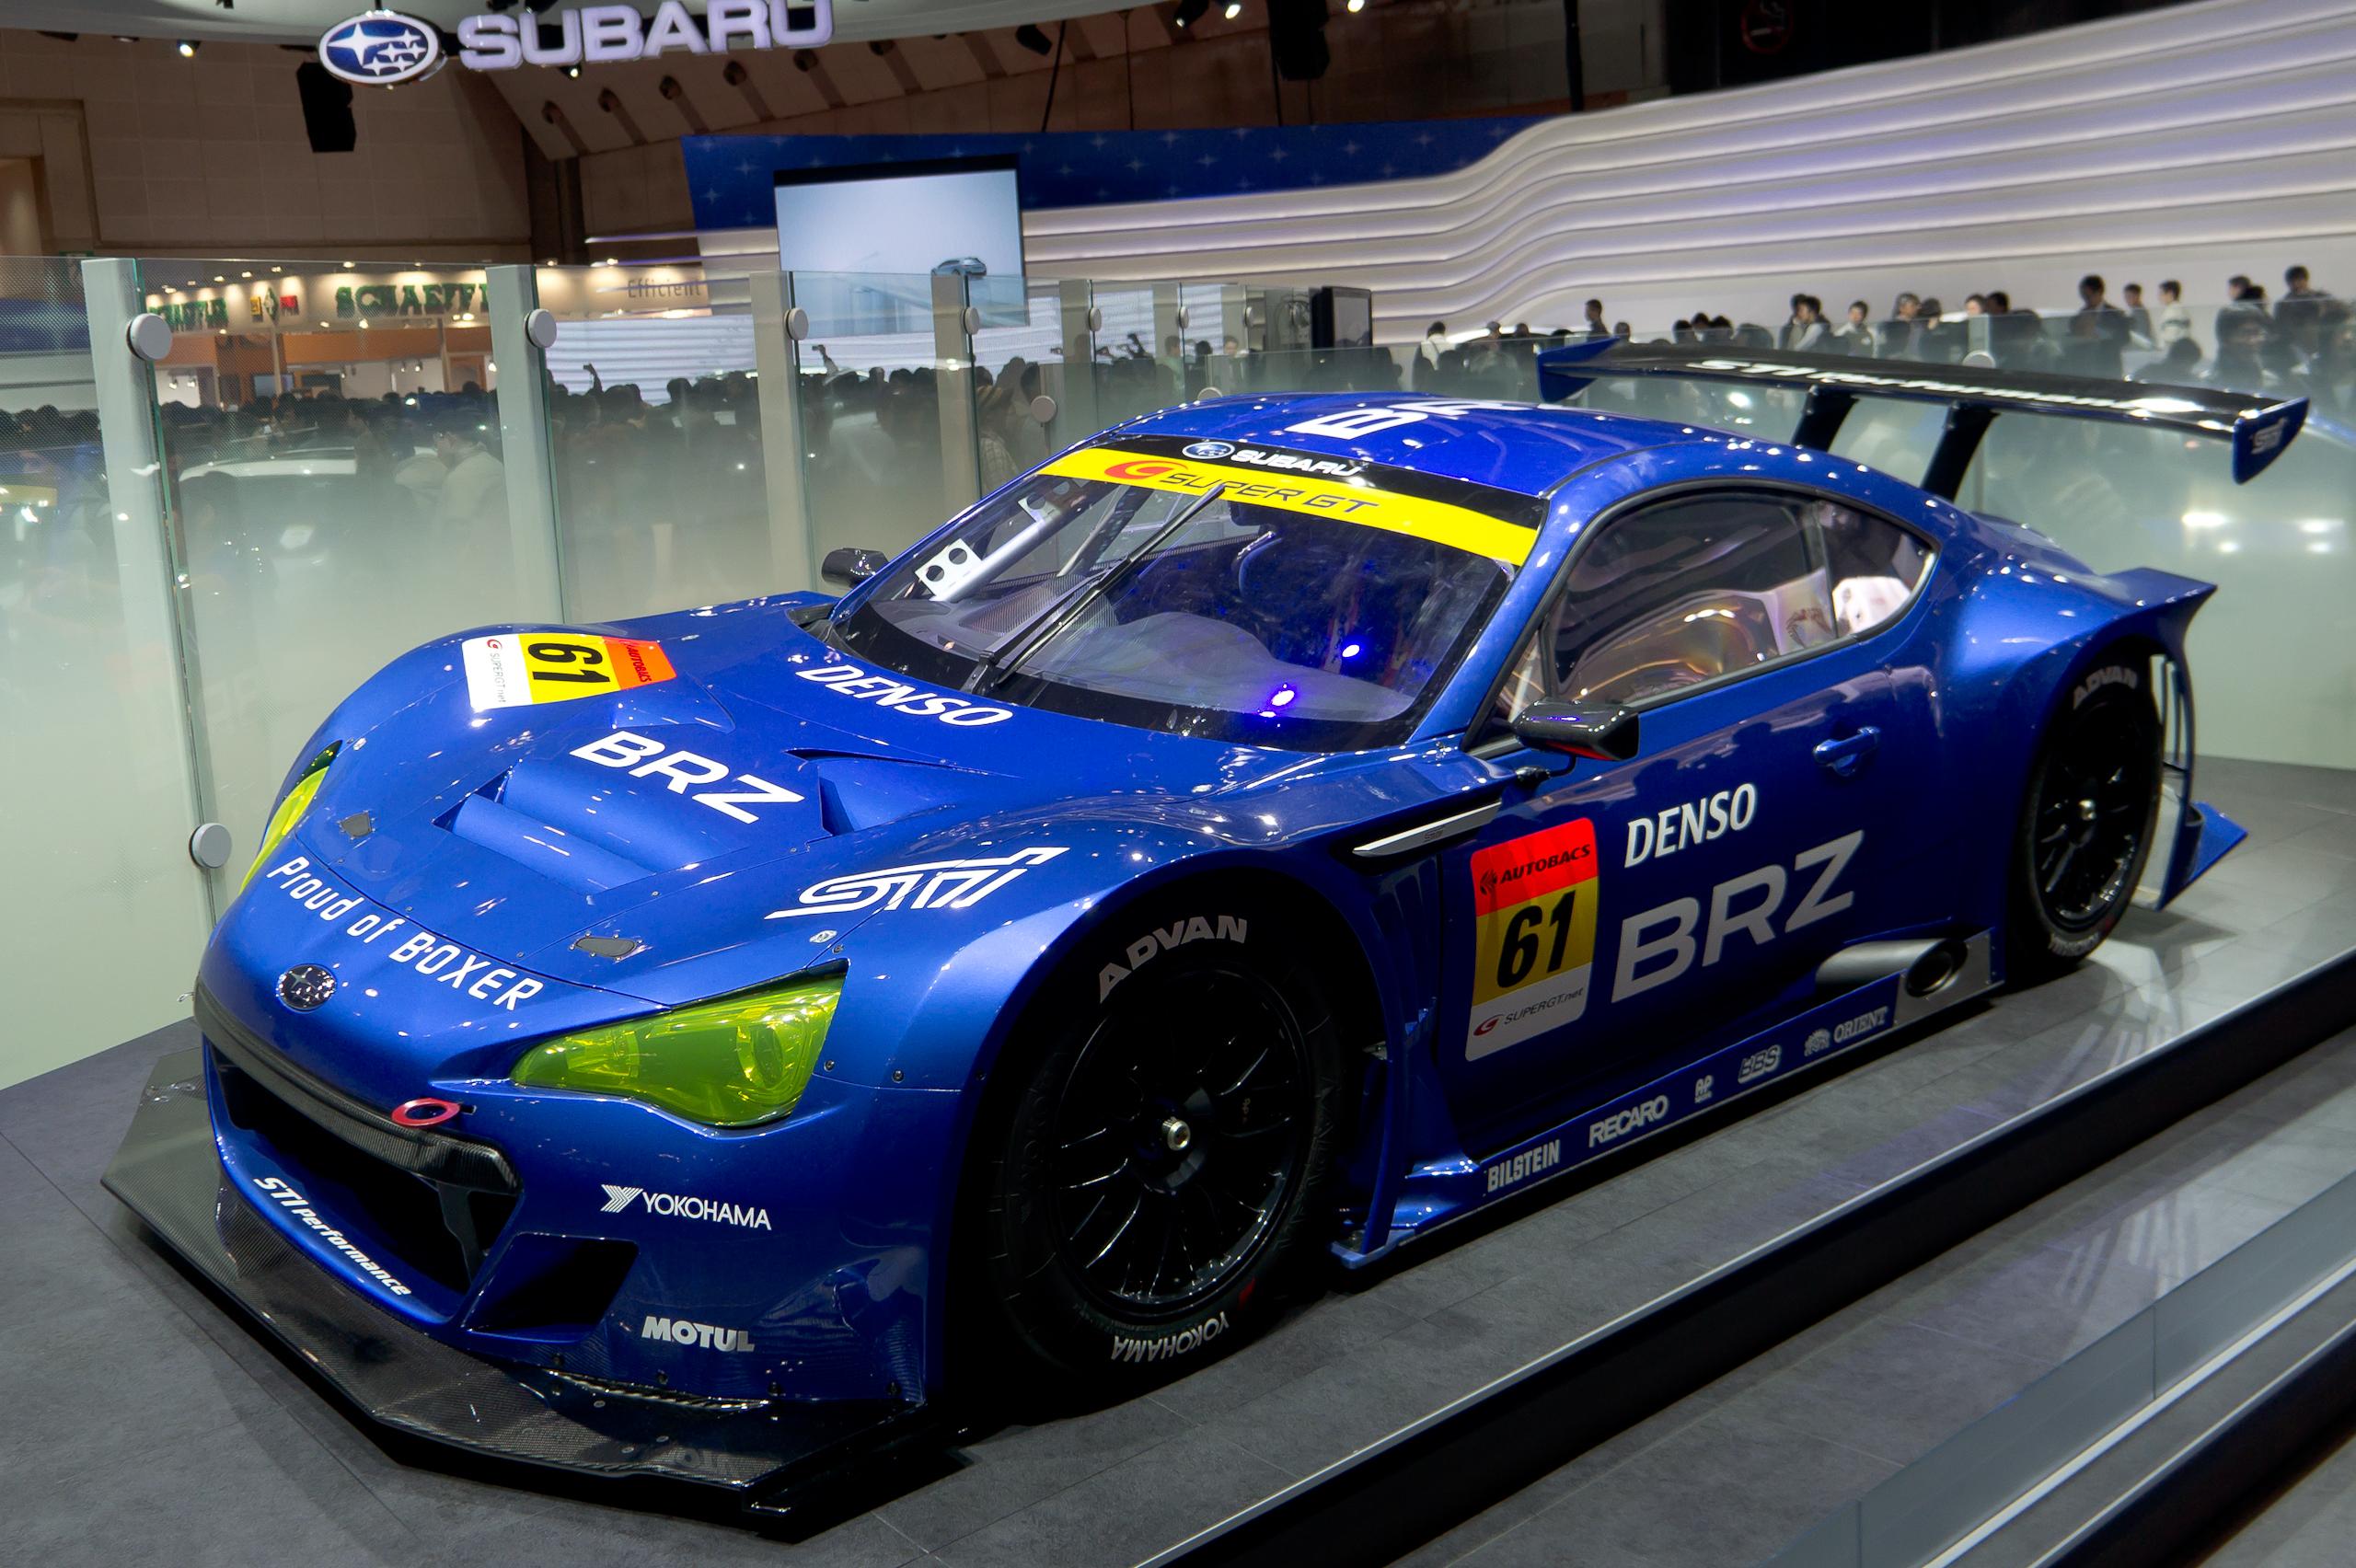 File:Subaru BRZ GT300 front 2011 Tokyo Motor Show.jpg ...